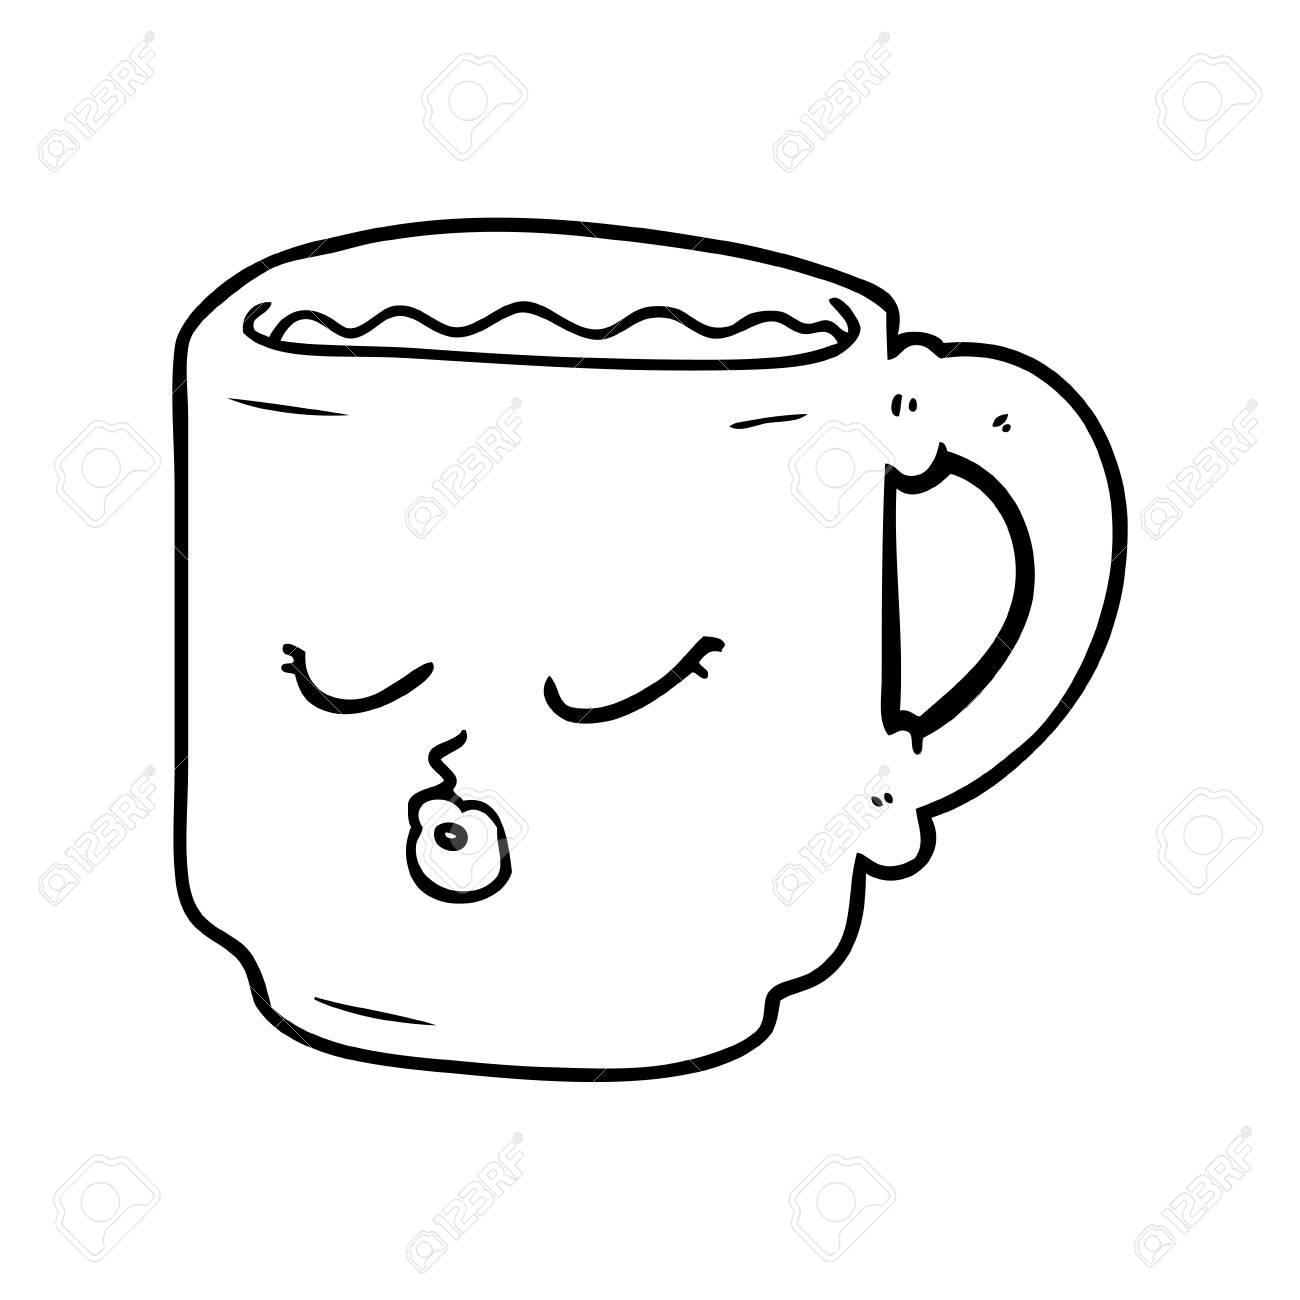 Hand Drawn Cartoon Coffee Mug Royalty Free Cliparts Vectors And Stock Illustration Image 95761570